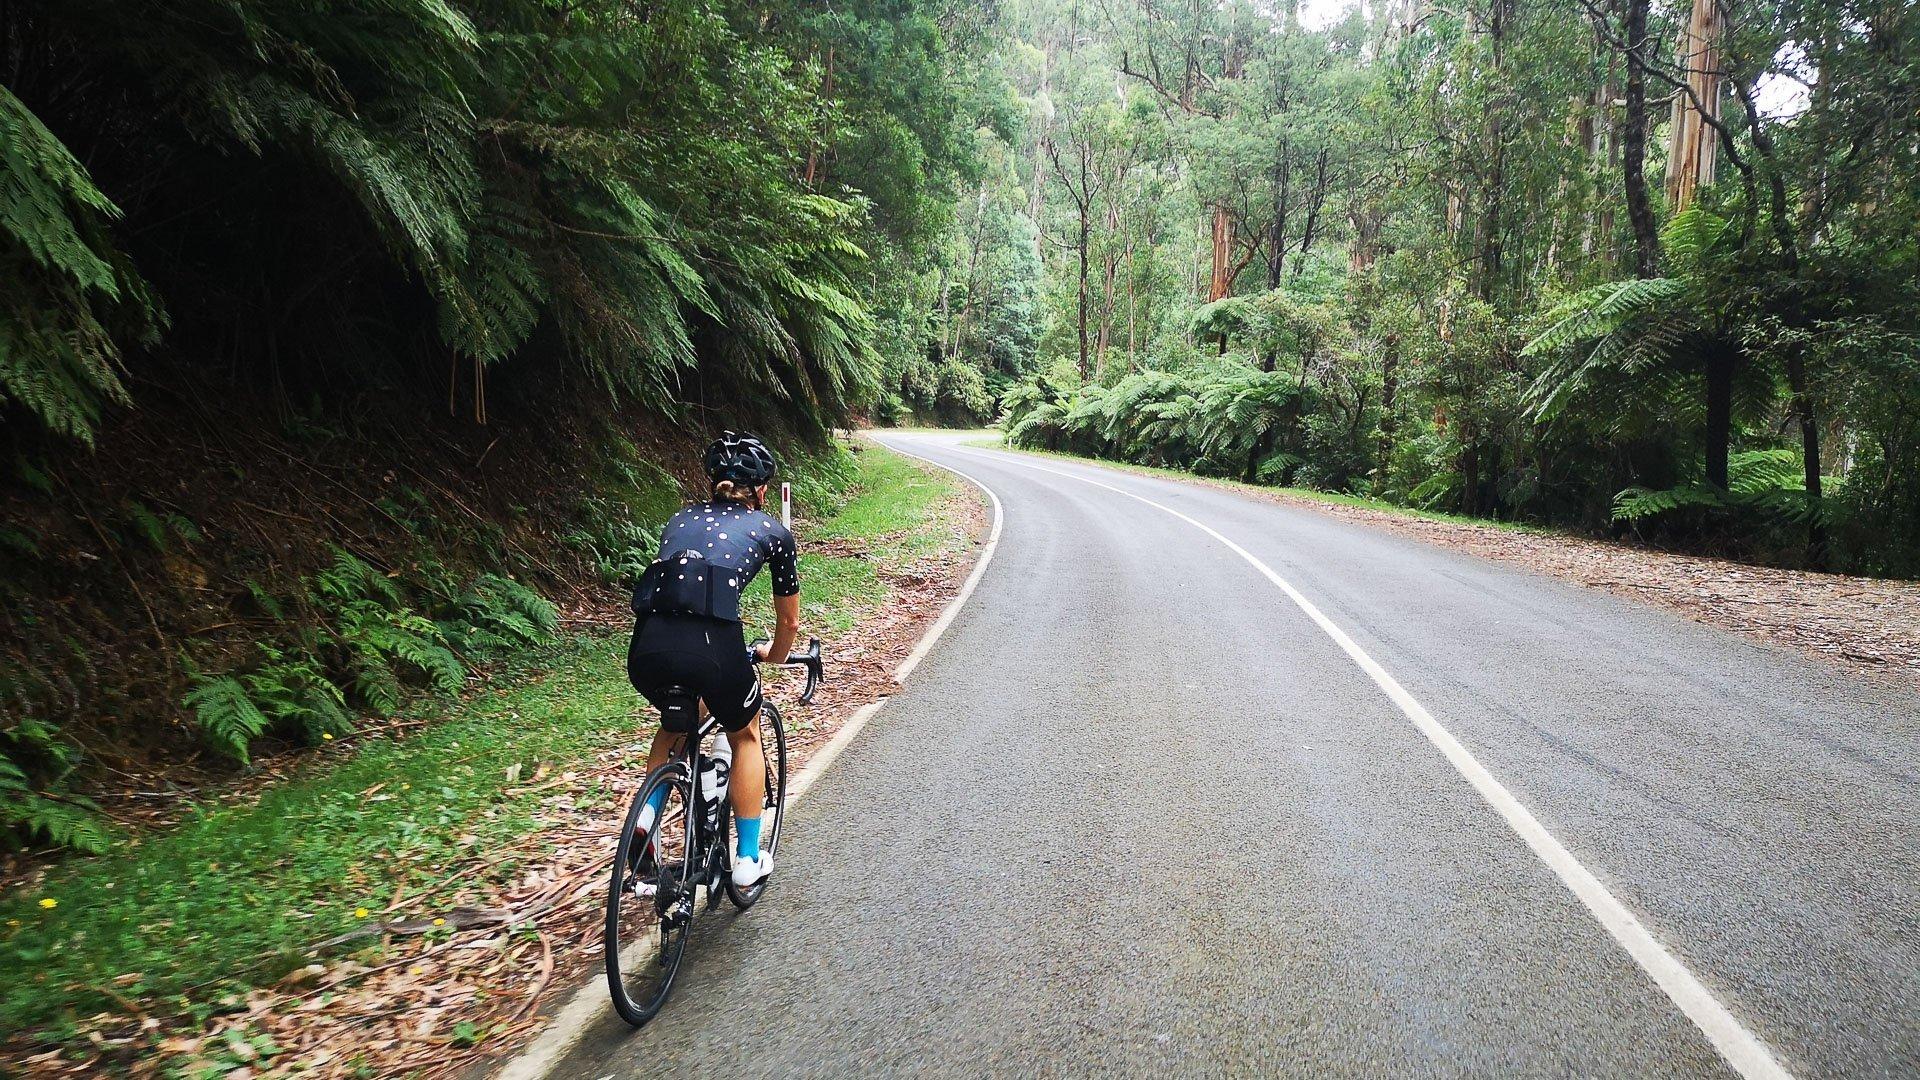 7 peaks yarra valley road rainforest ferns